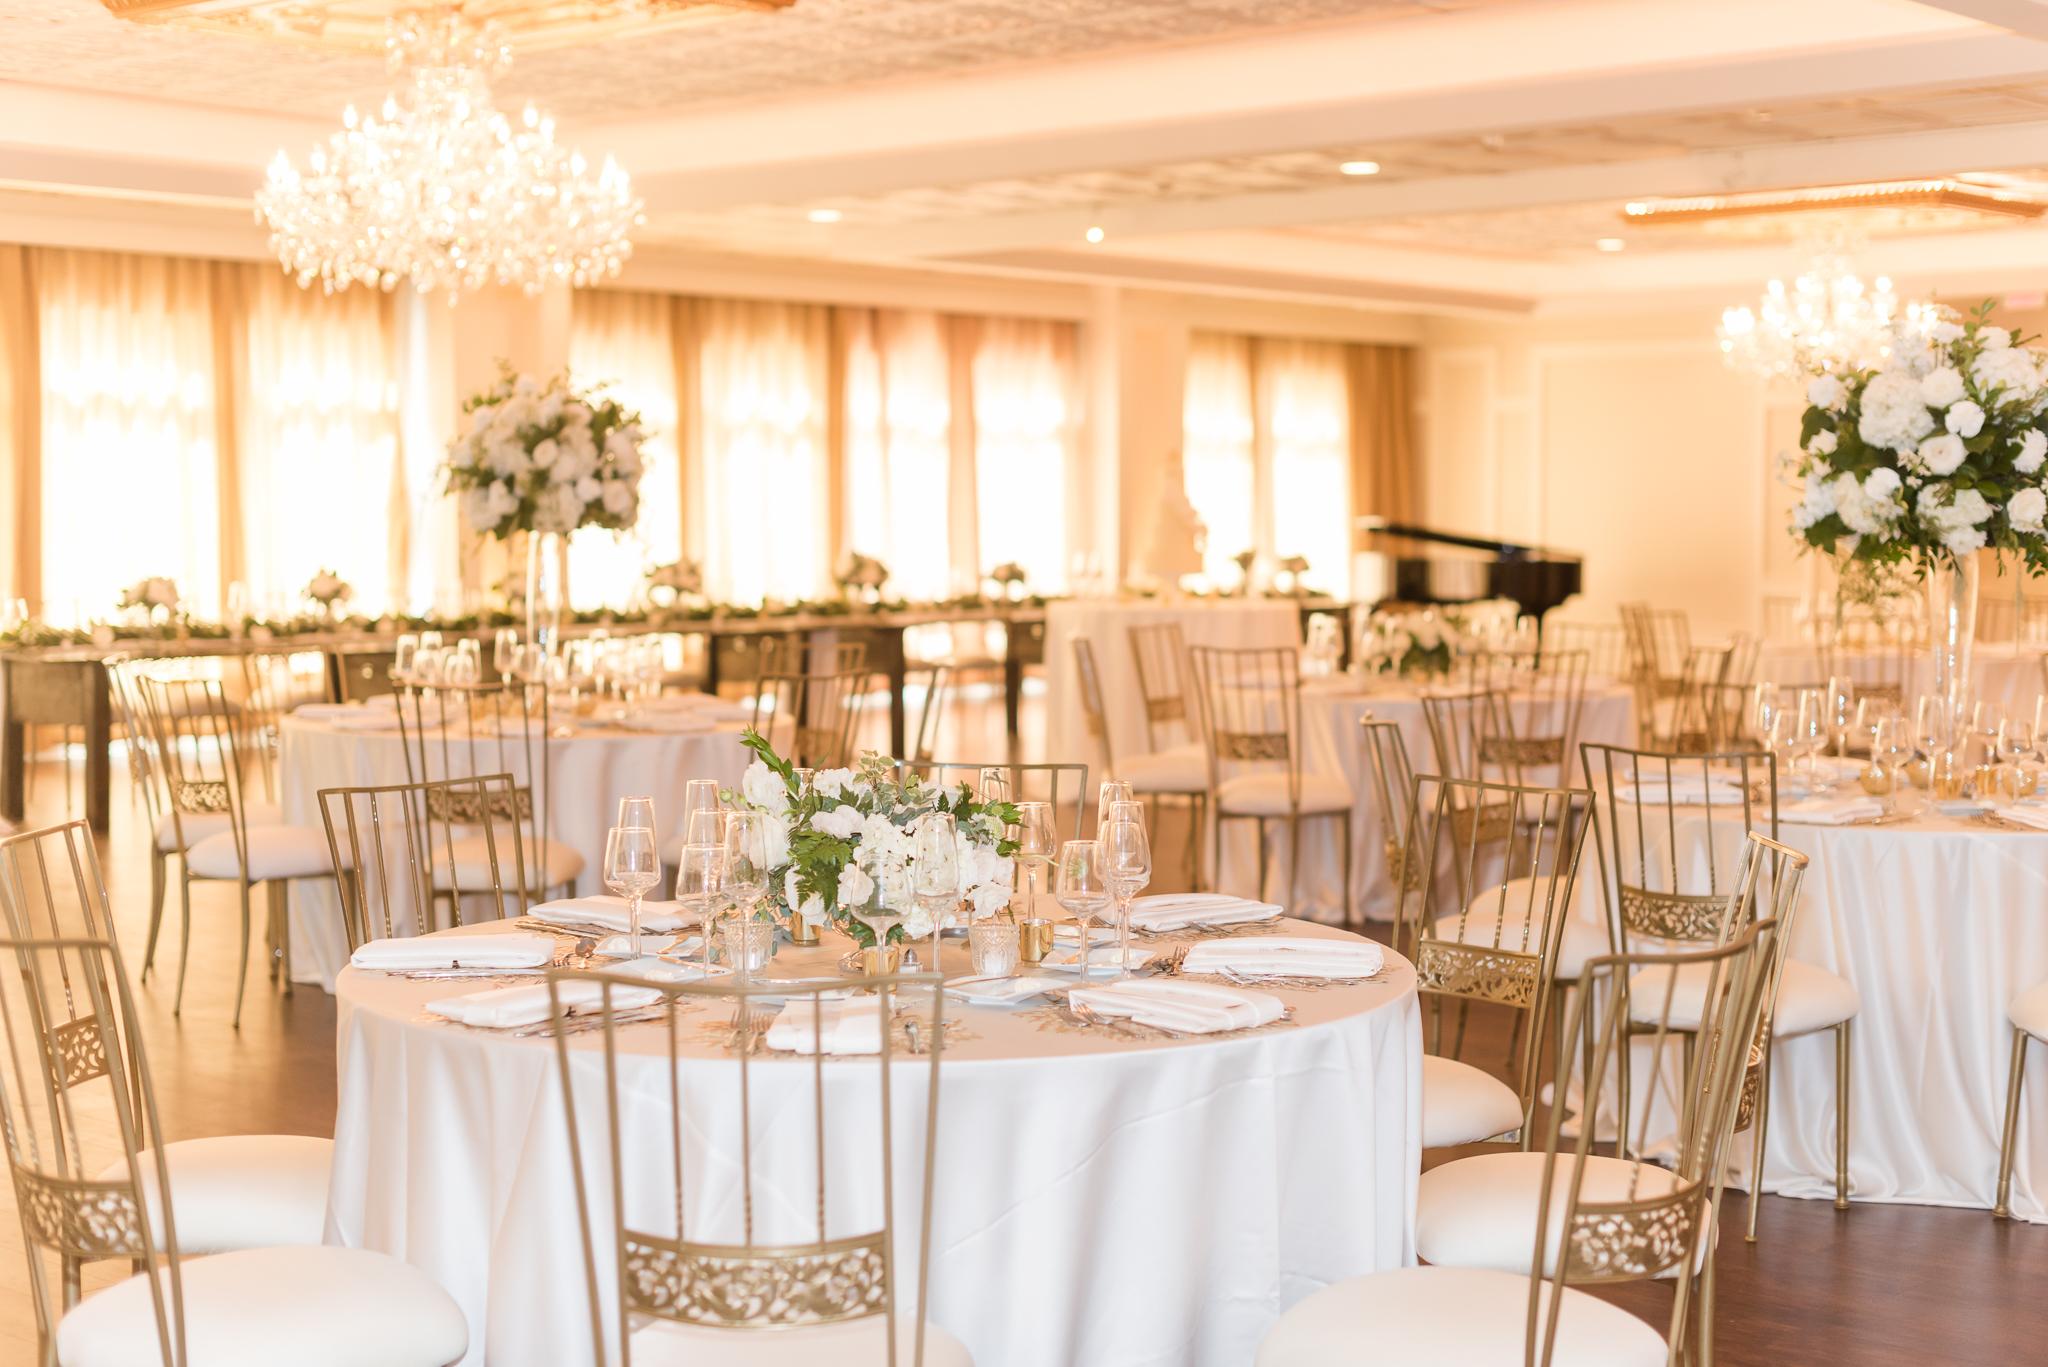 Black Iris Estate Wedding Elegant White with Greenery Luxury High End Flowers-16.jpg